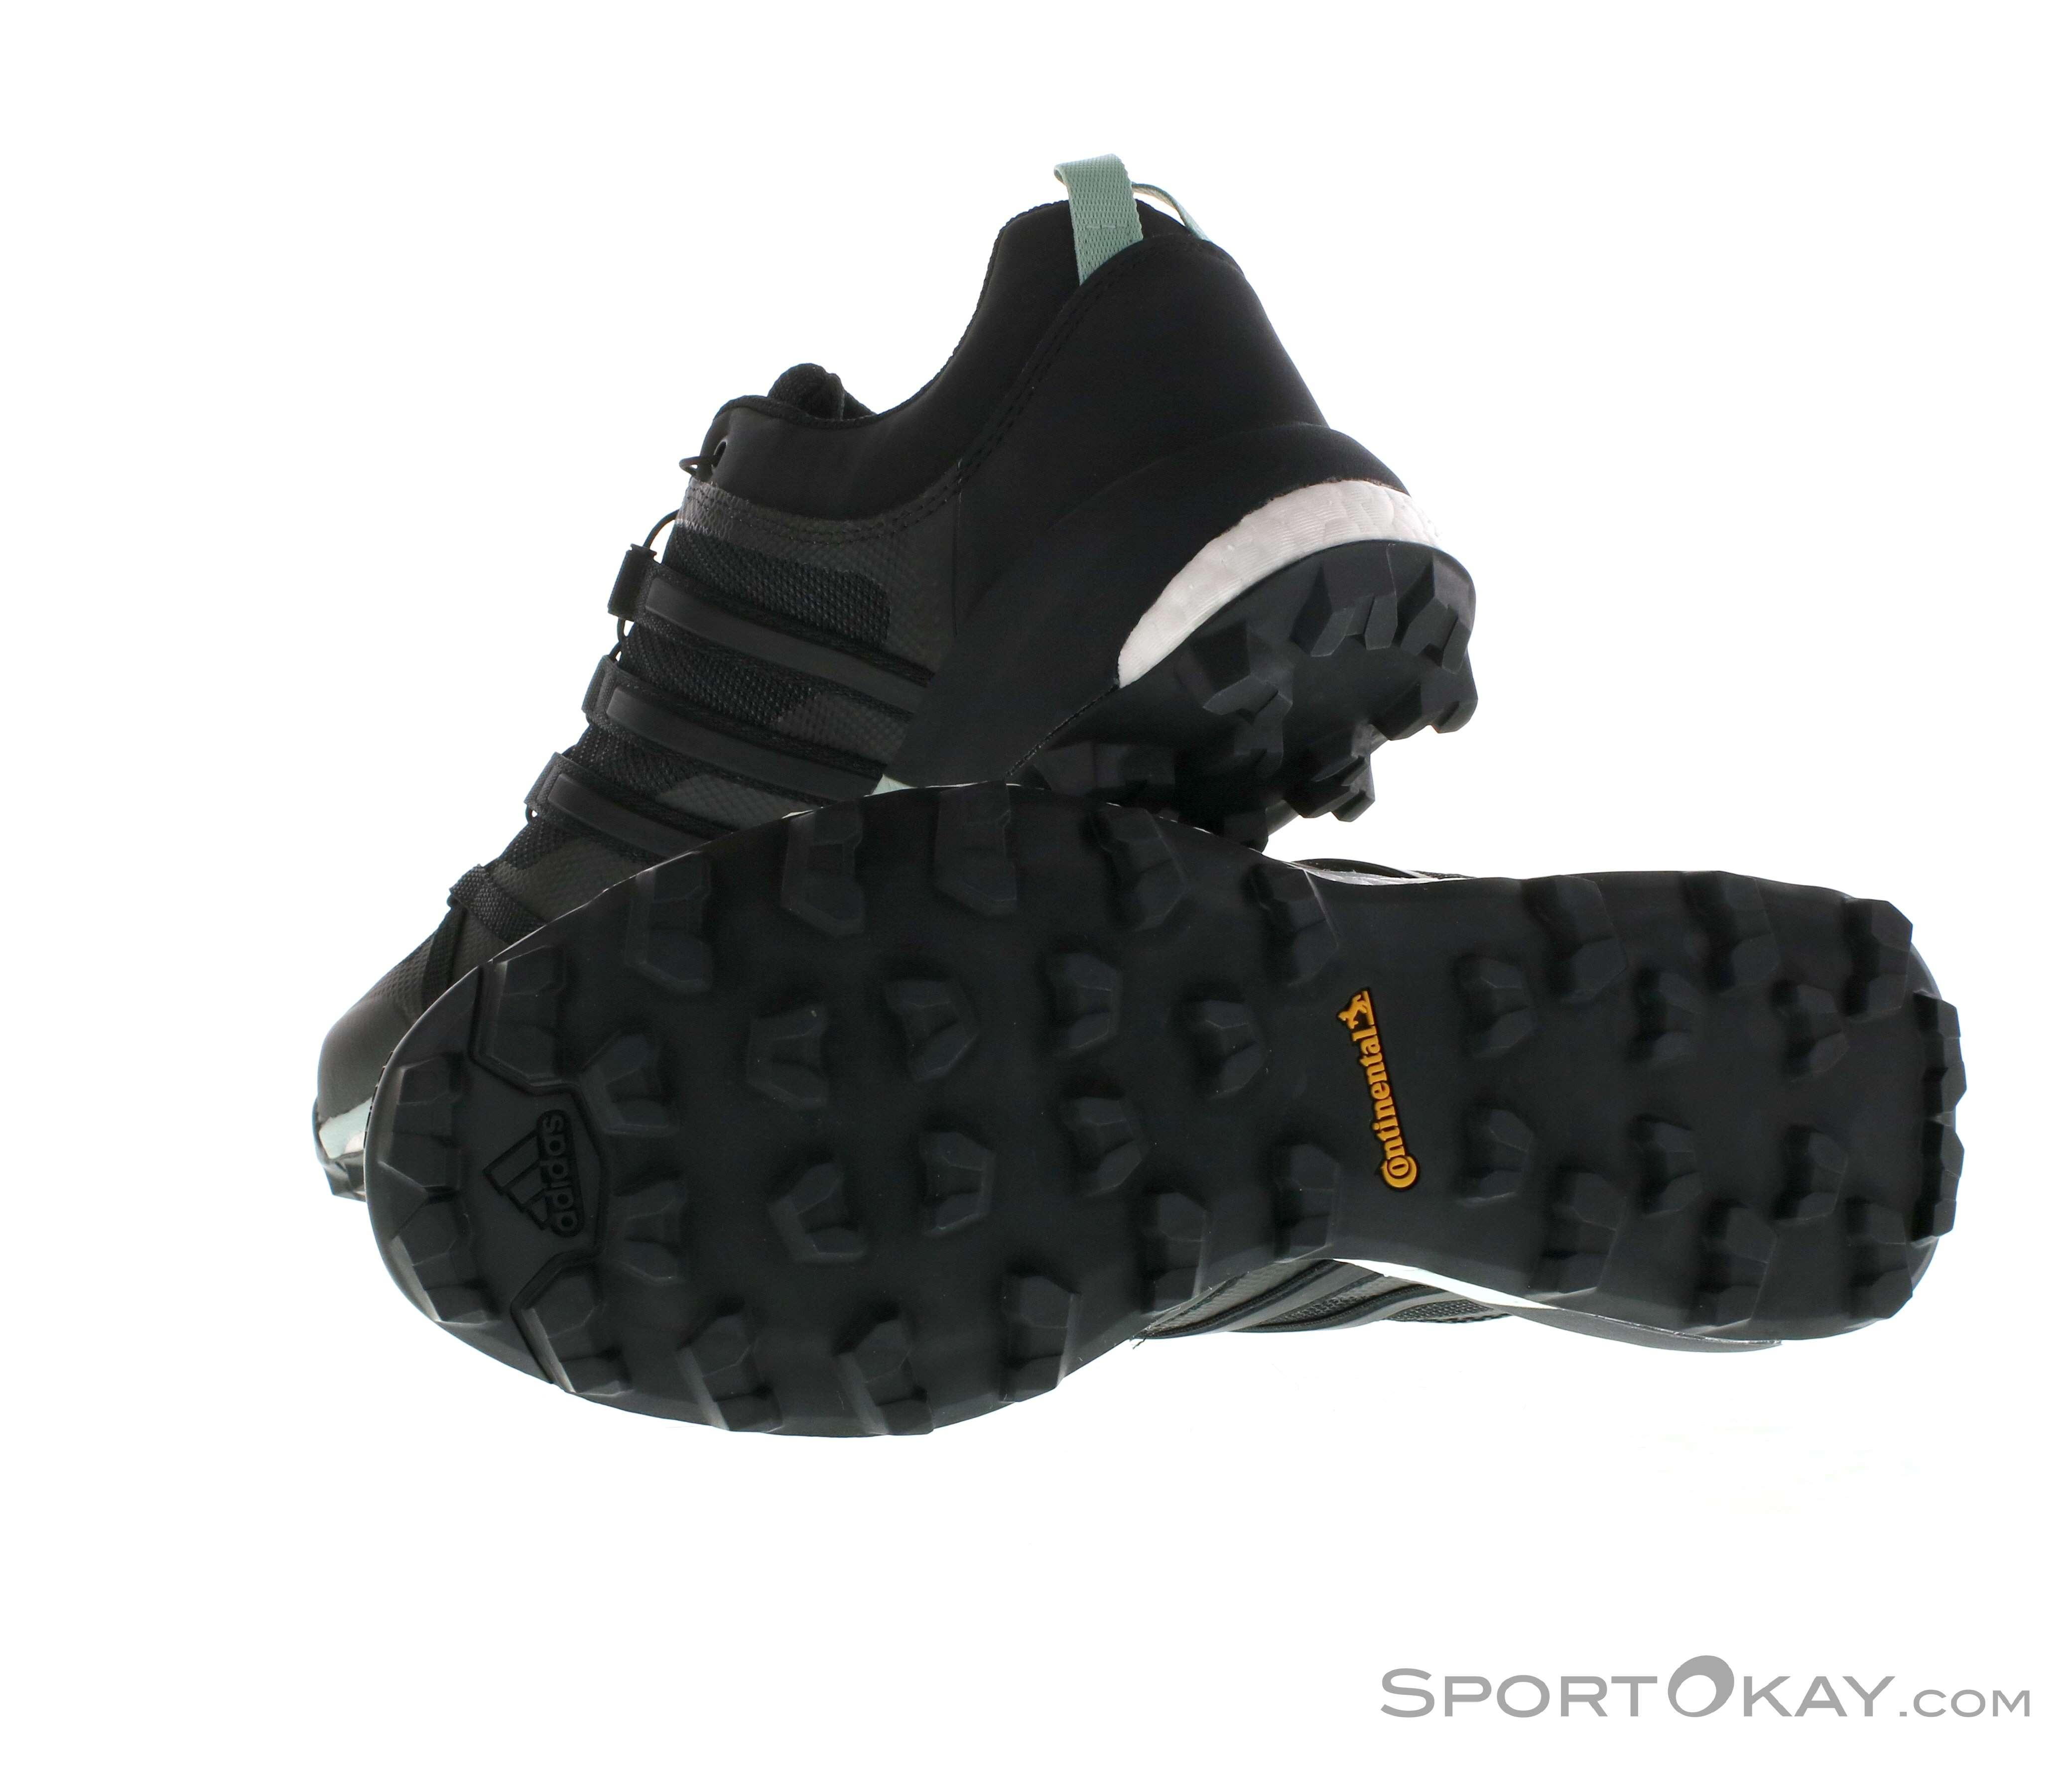 adidas Terrex Skychaser Donna Scarpe Trail Running Gore-Tex - Scarpe ... 05f0ca155ce